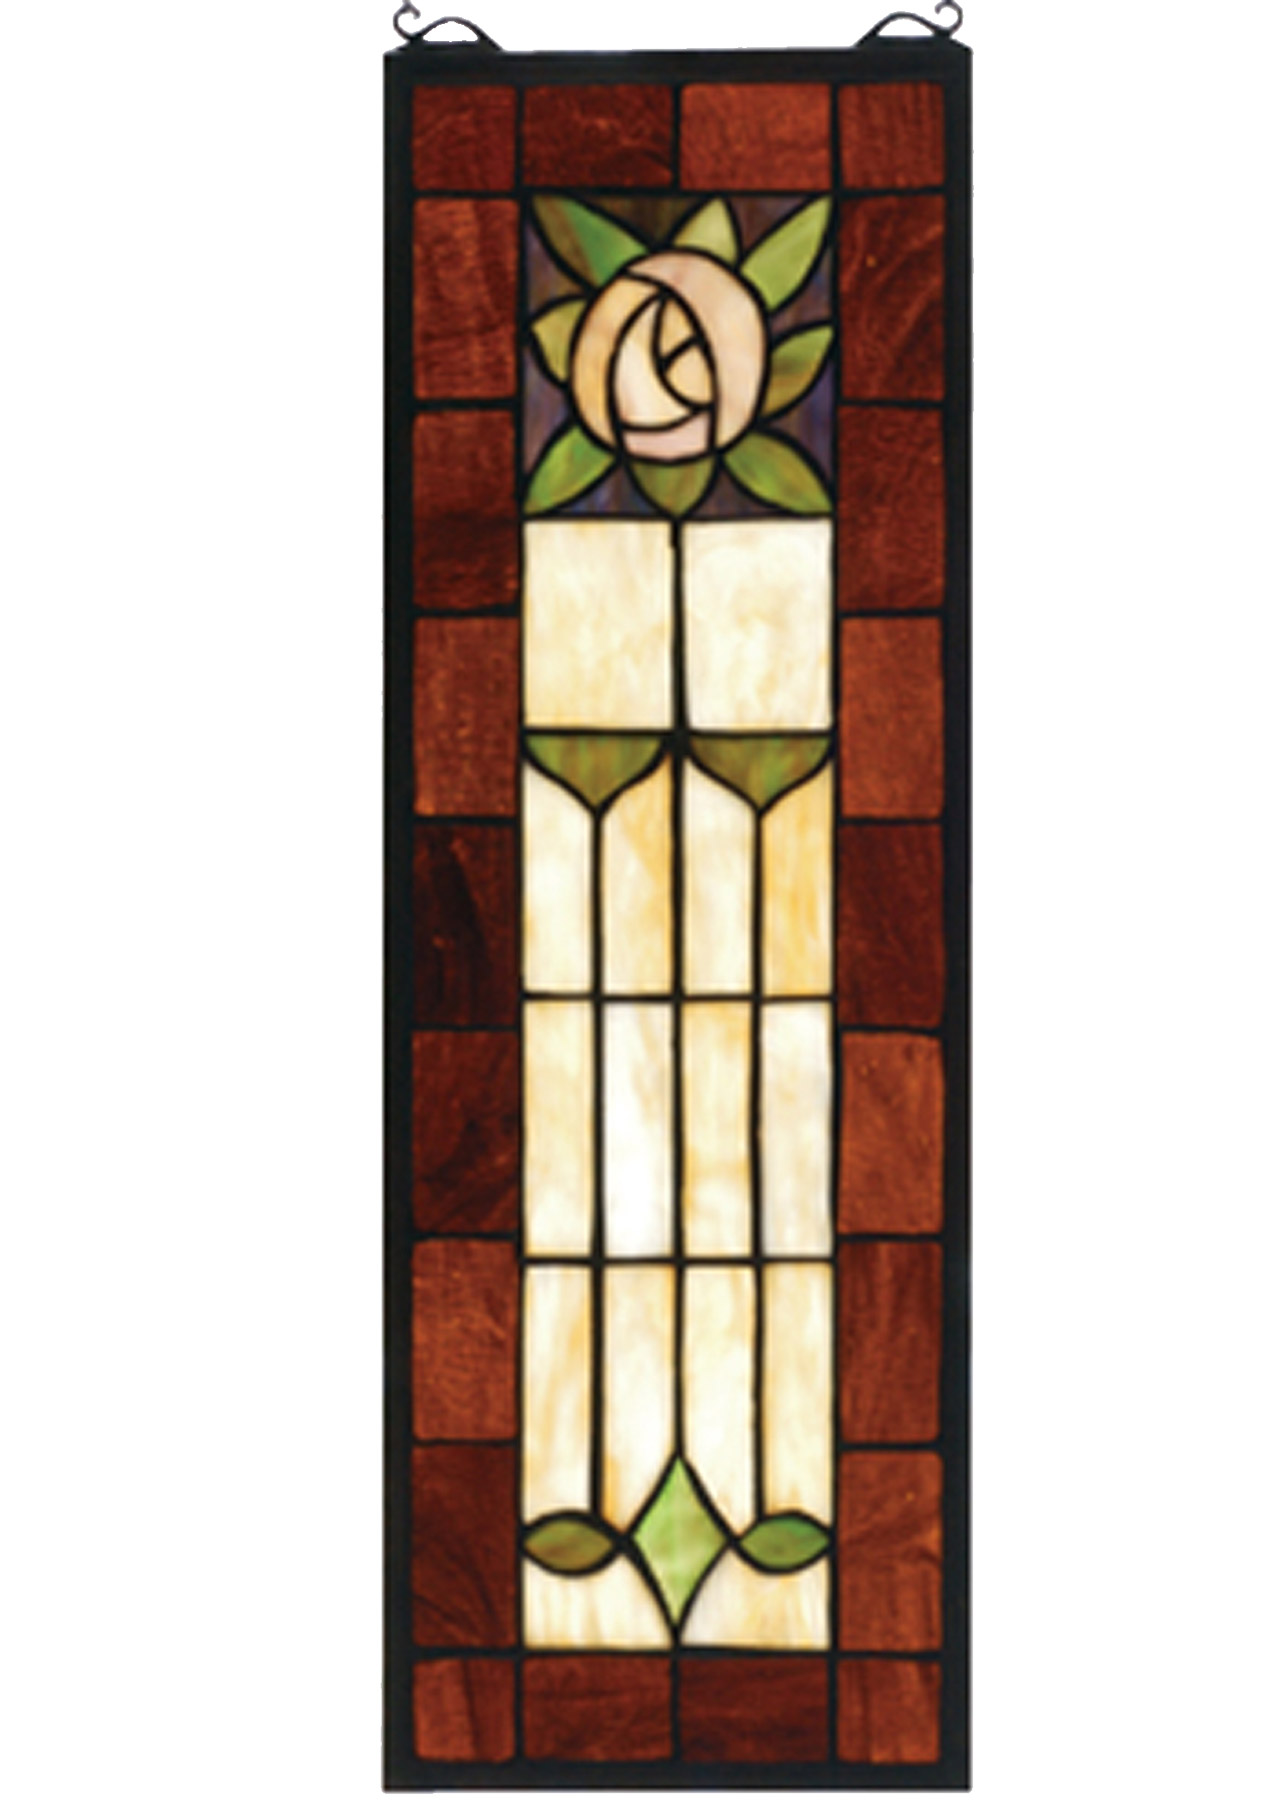 Meyda 67791 Pasadena Rose Stained Glass Window